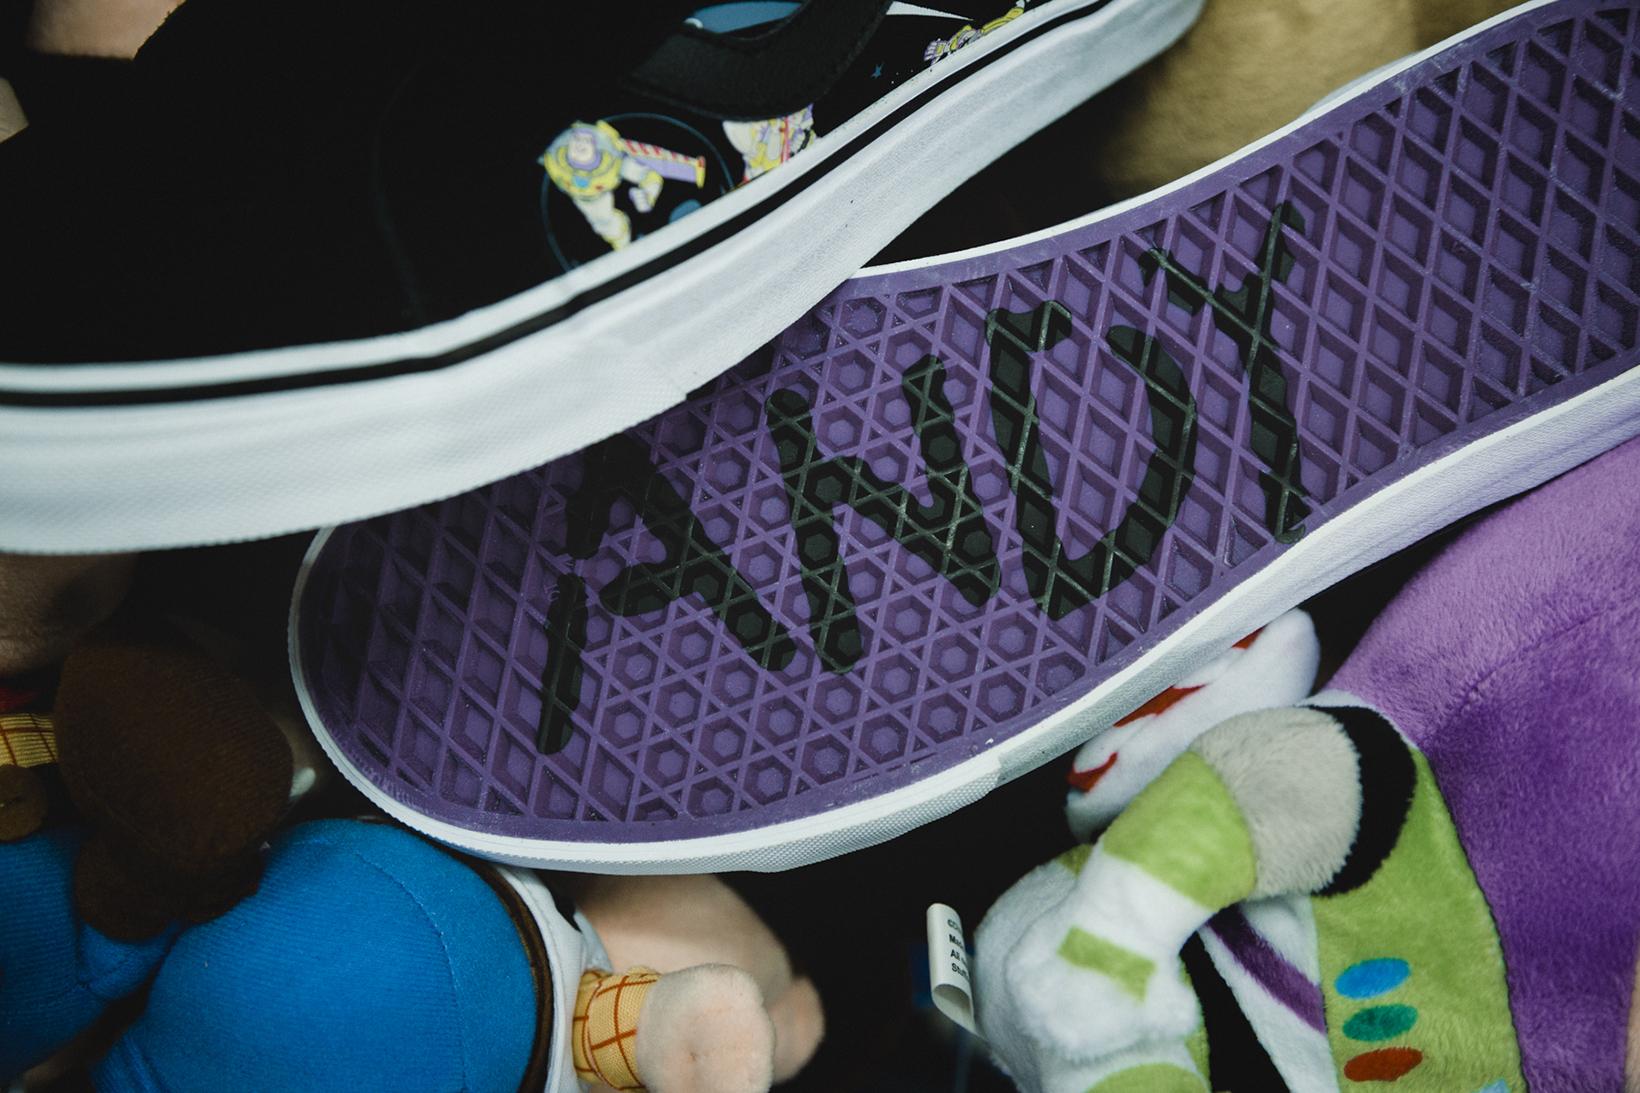 Toy Story Vans Sneakers Woody Buzz Lightyear Disney - 1765039